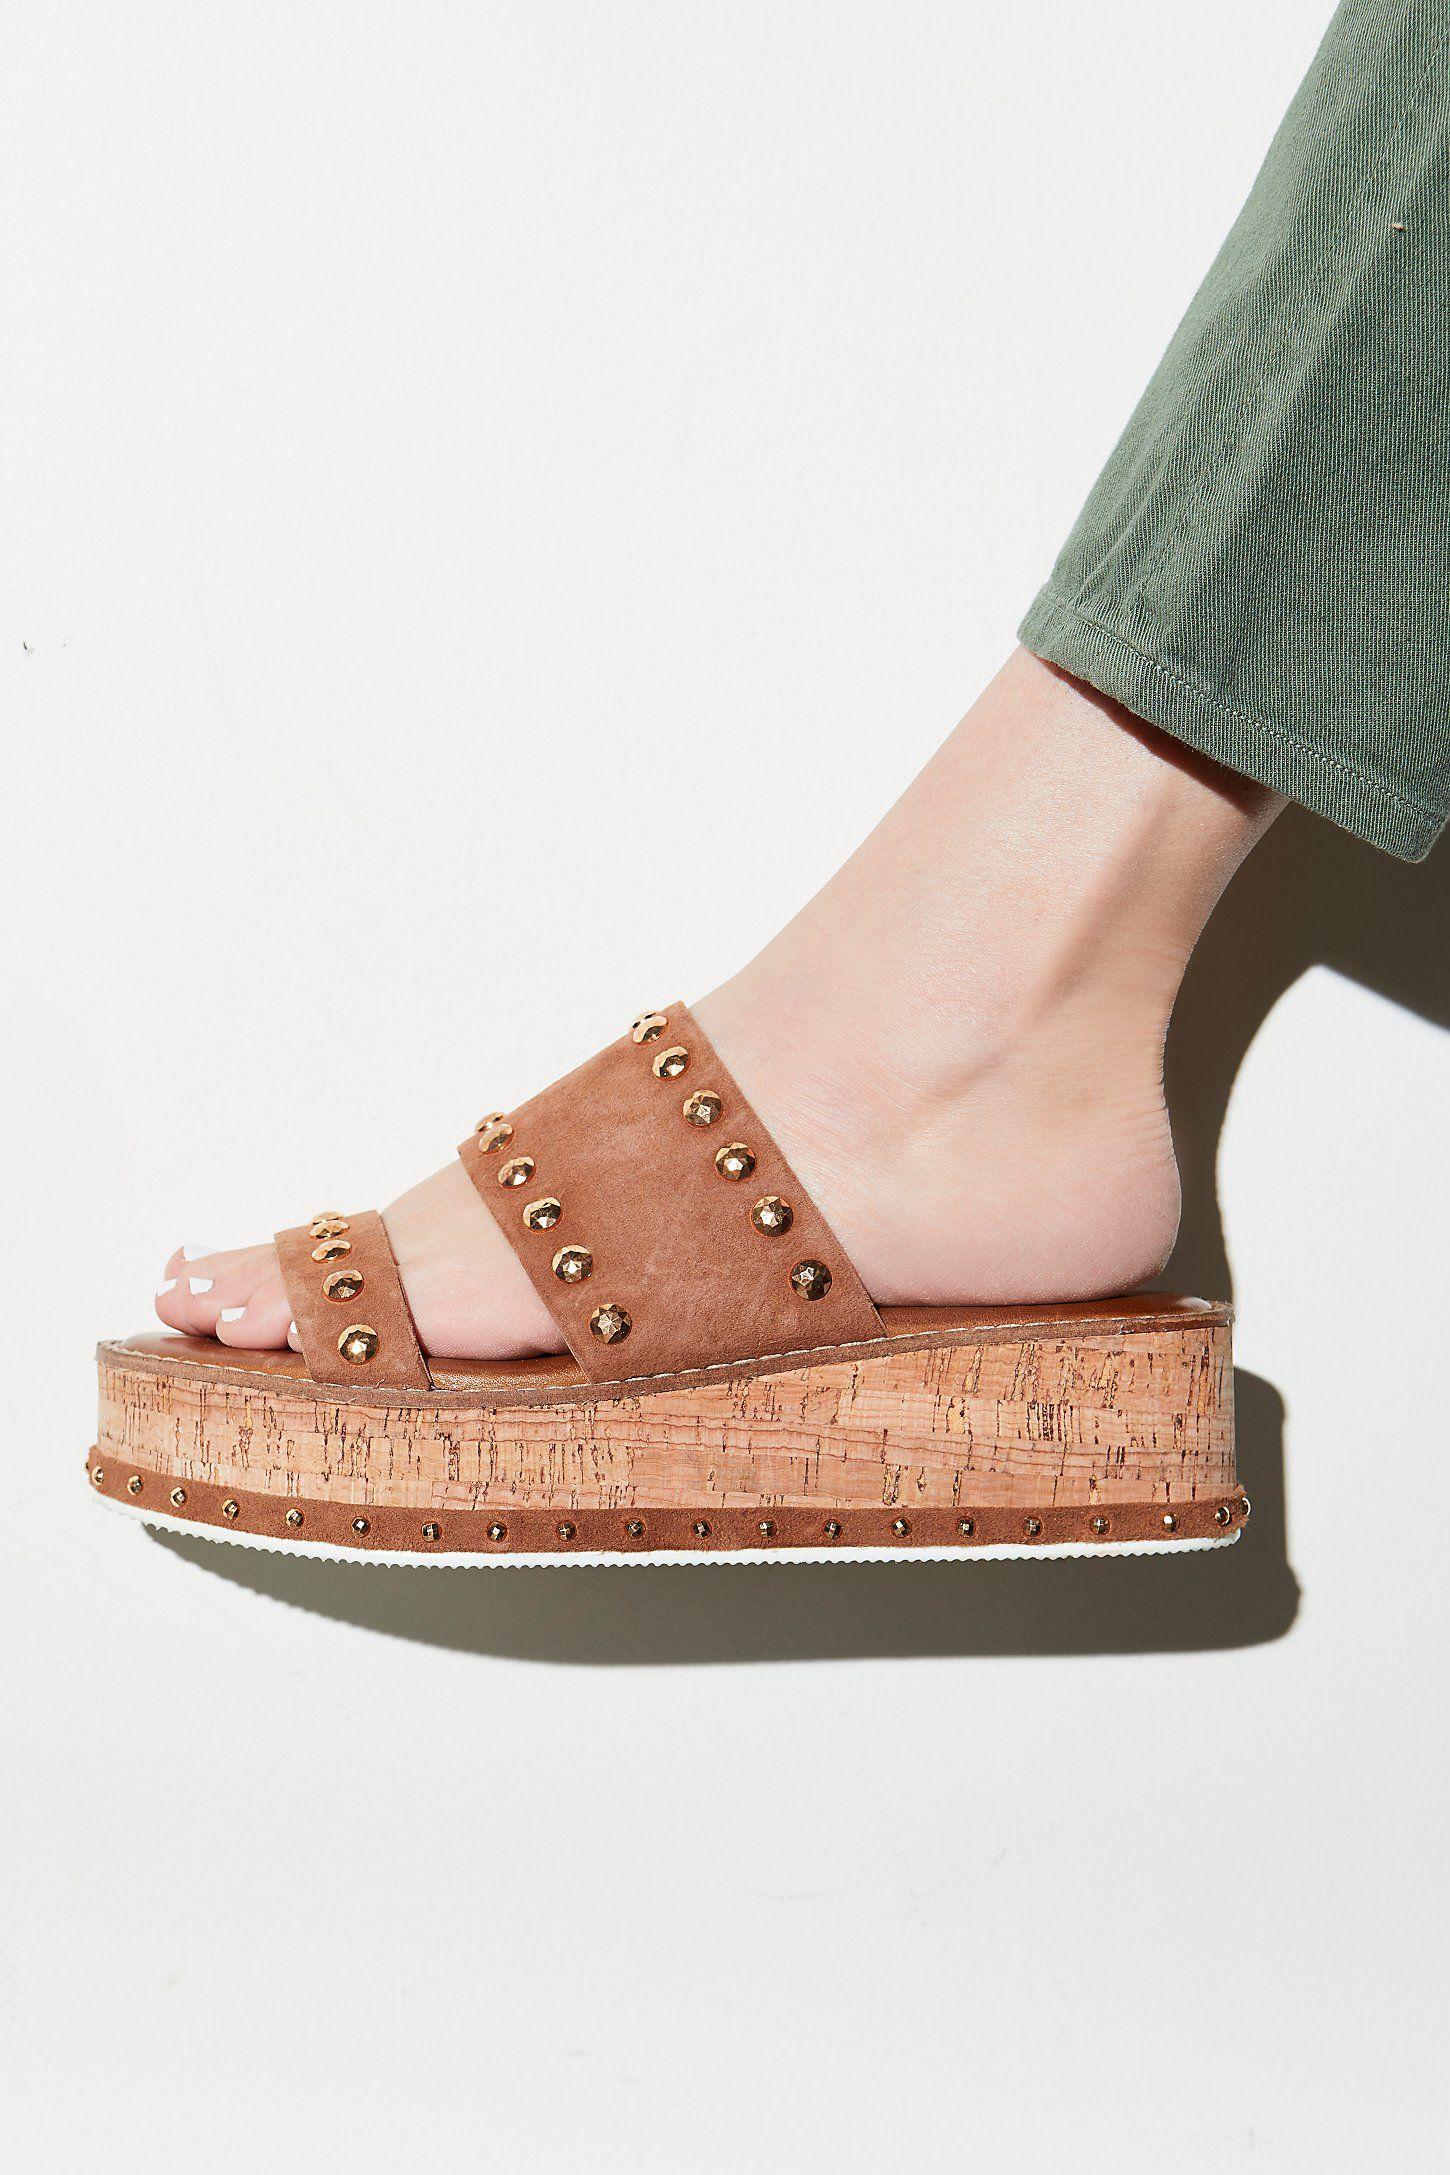 7b5972627b Lola Flatform Sandal in 2019 | Stylin' | Sandals, Shoes, Shoes sandals